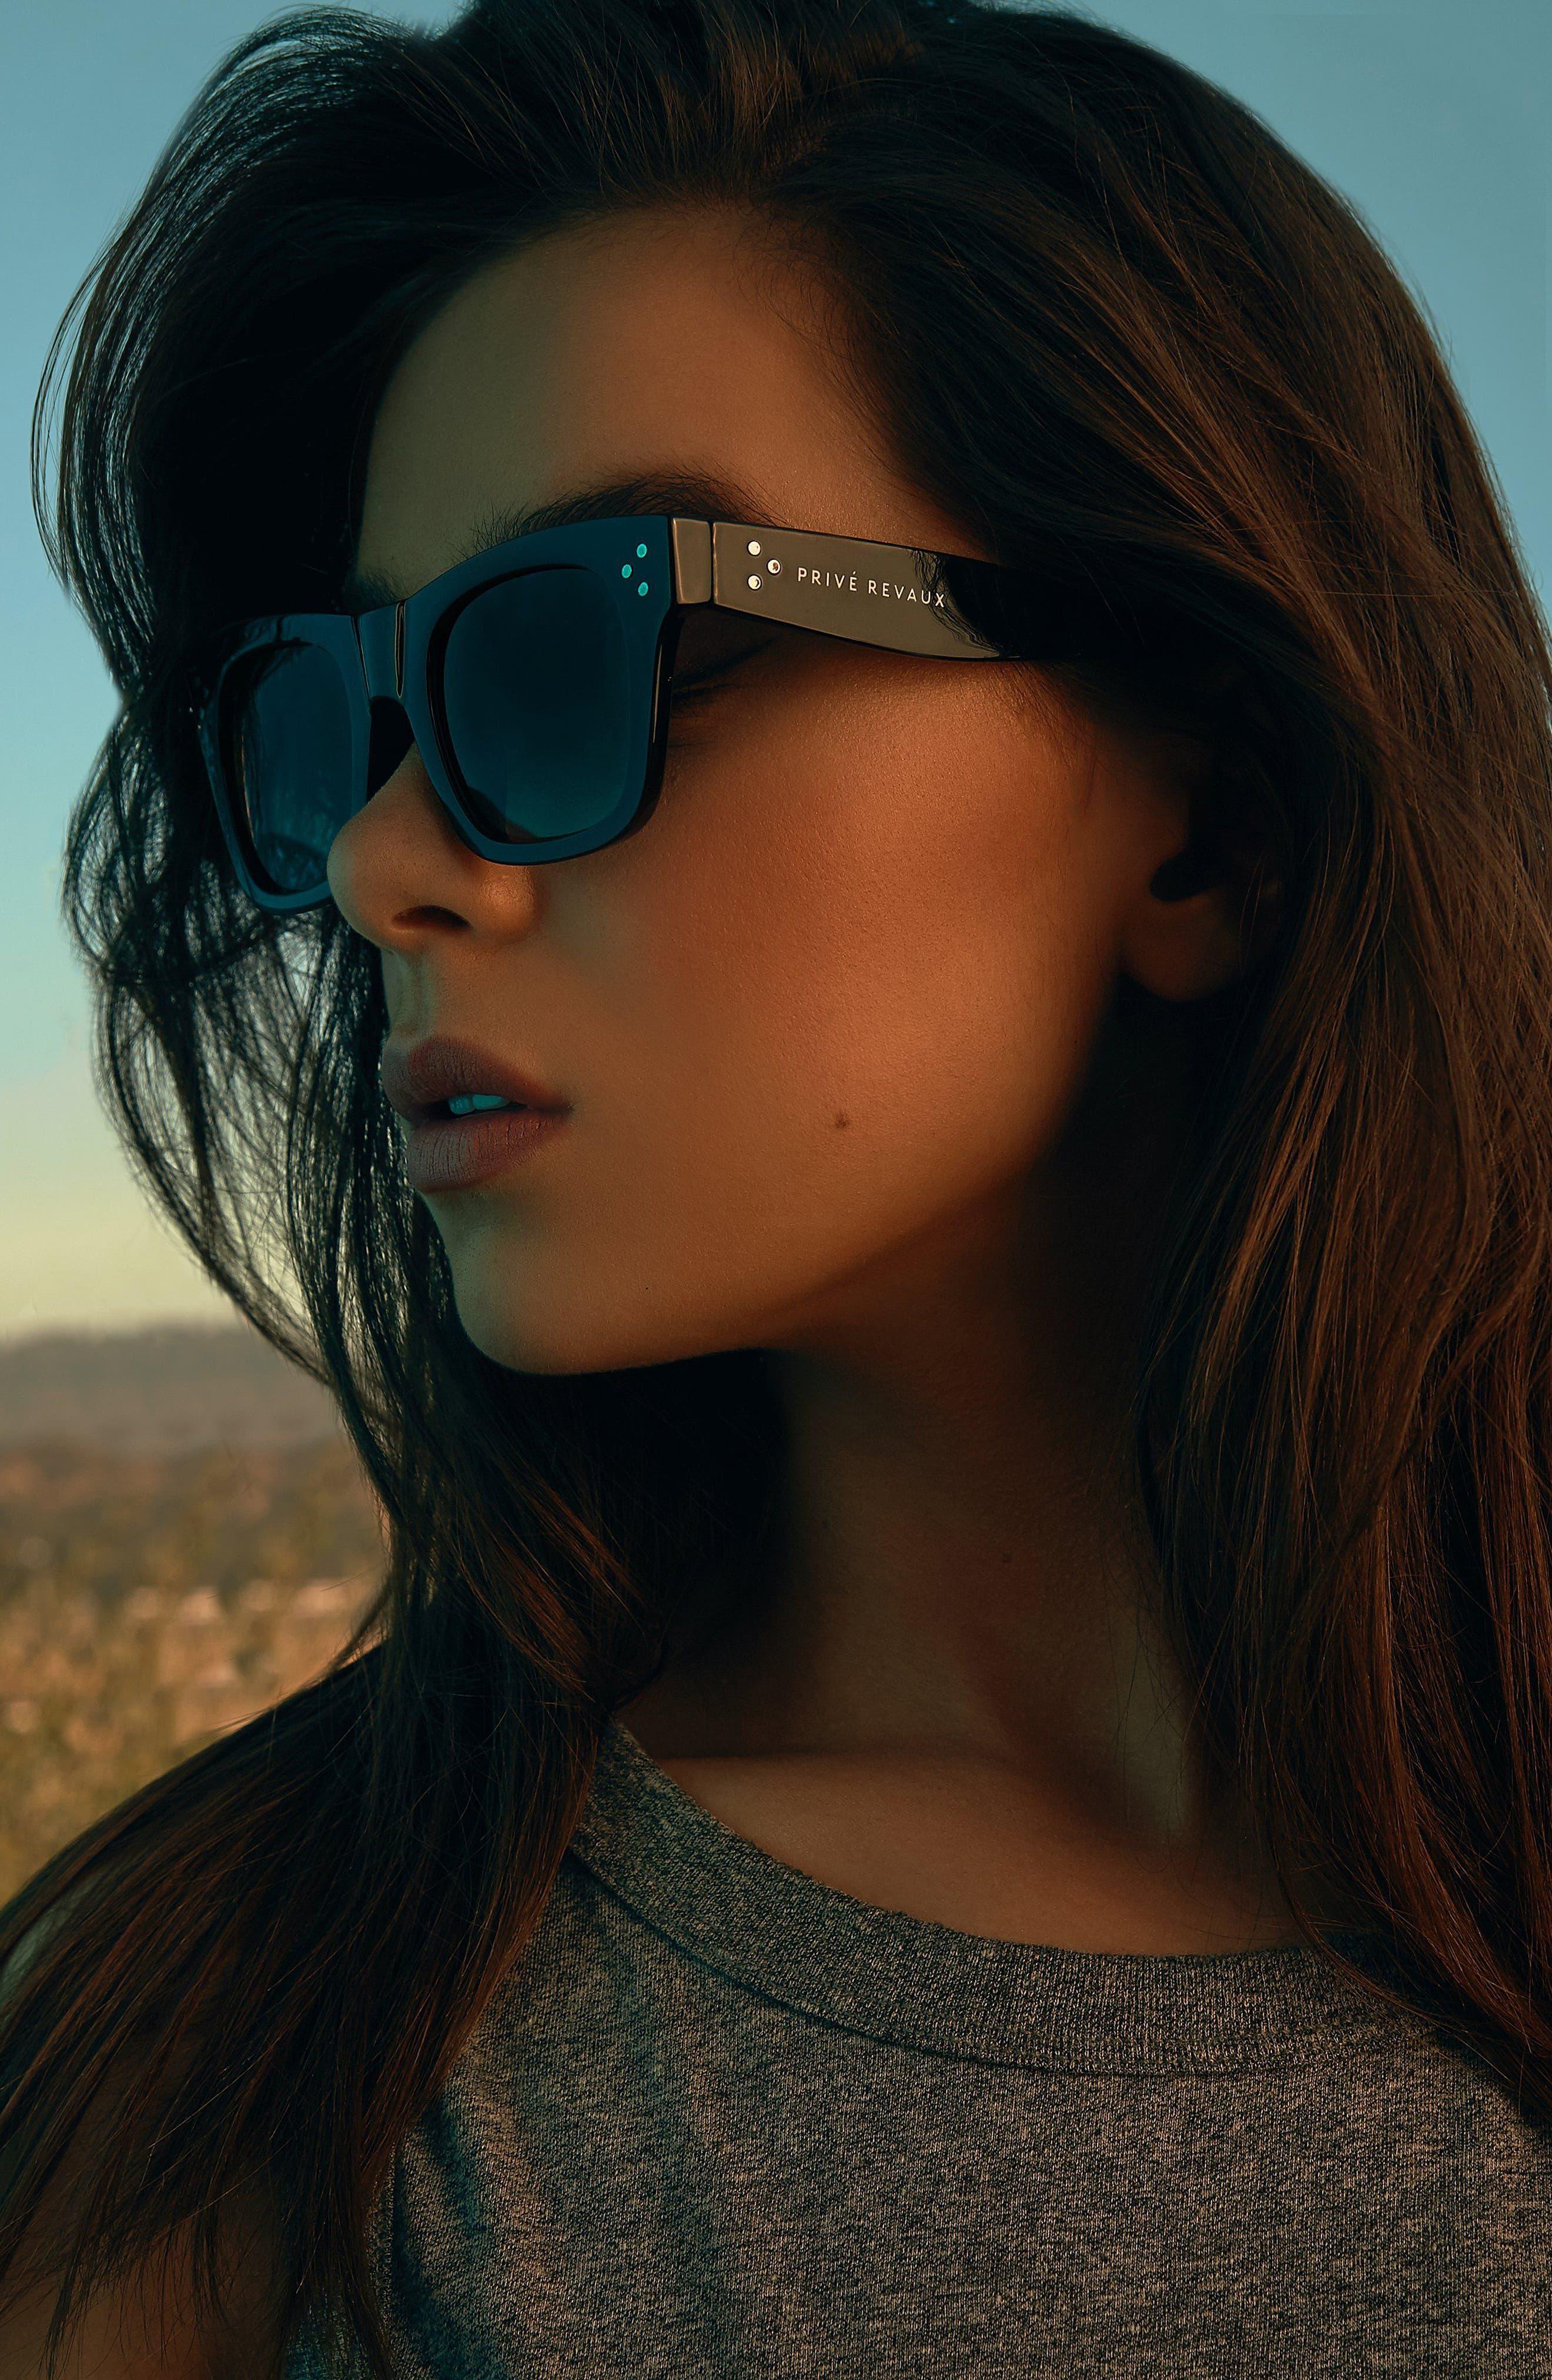 Privé Revaux The Classic 51mm Polarized Square Sunglasses,                             Alternate thumbnail 2, color,                             Black